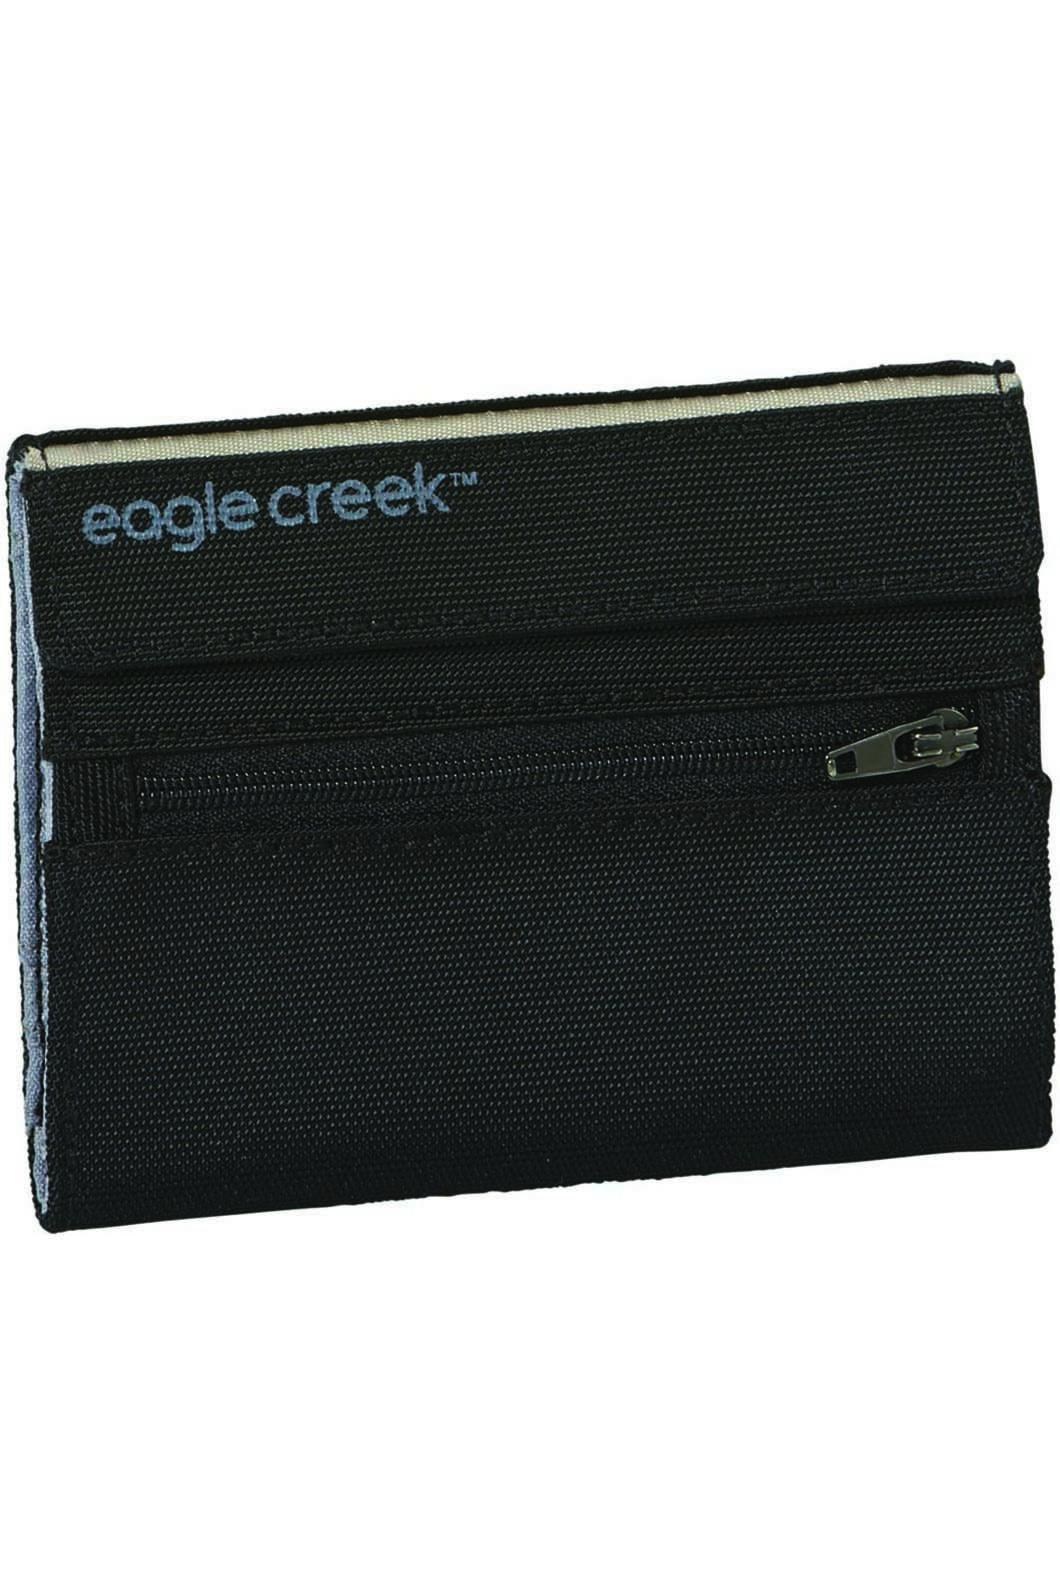 Eagle Creek RFID International Wallet, None, hi-res